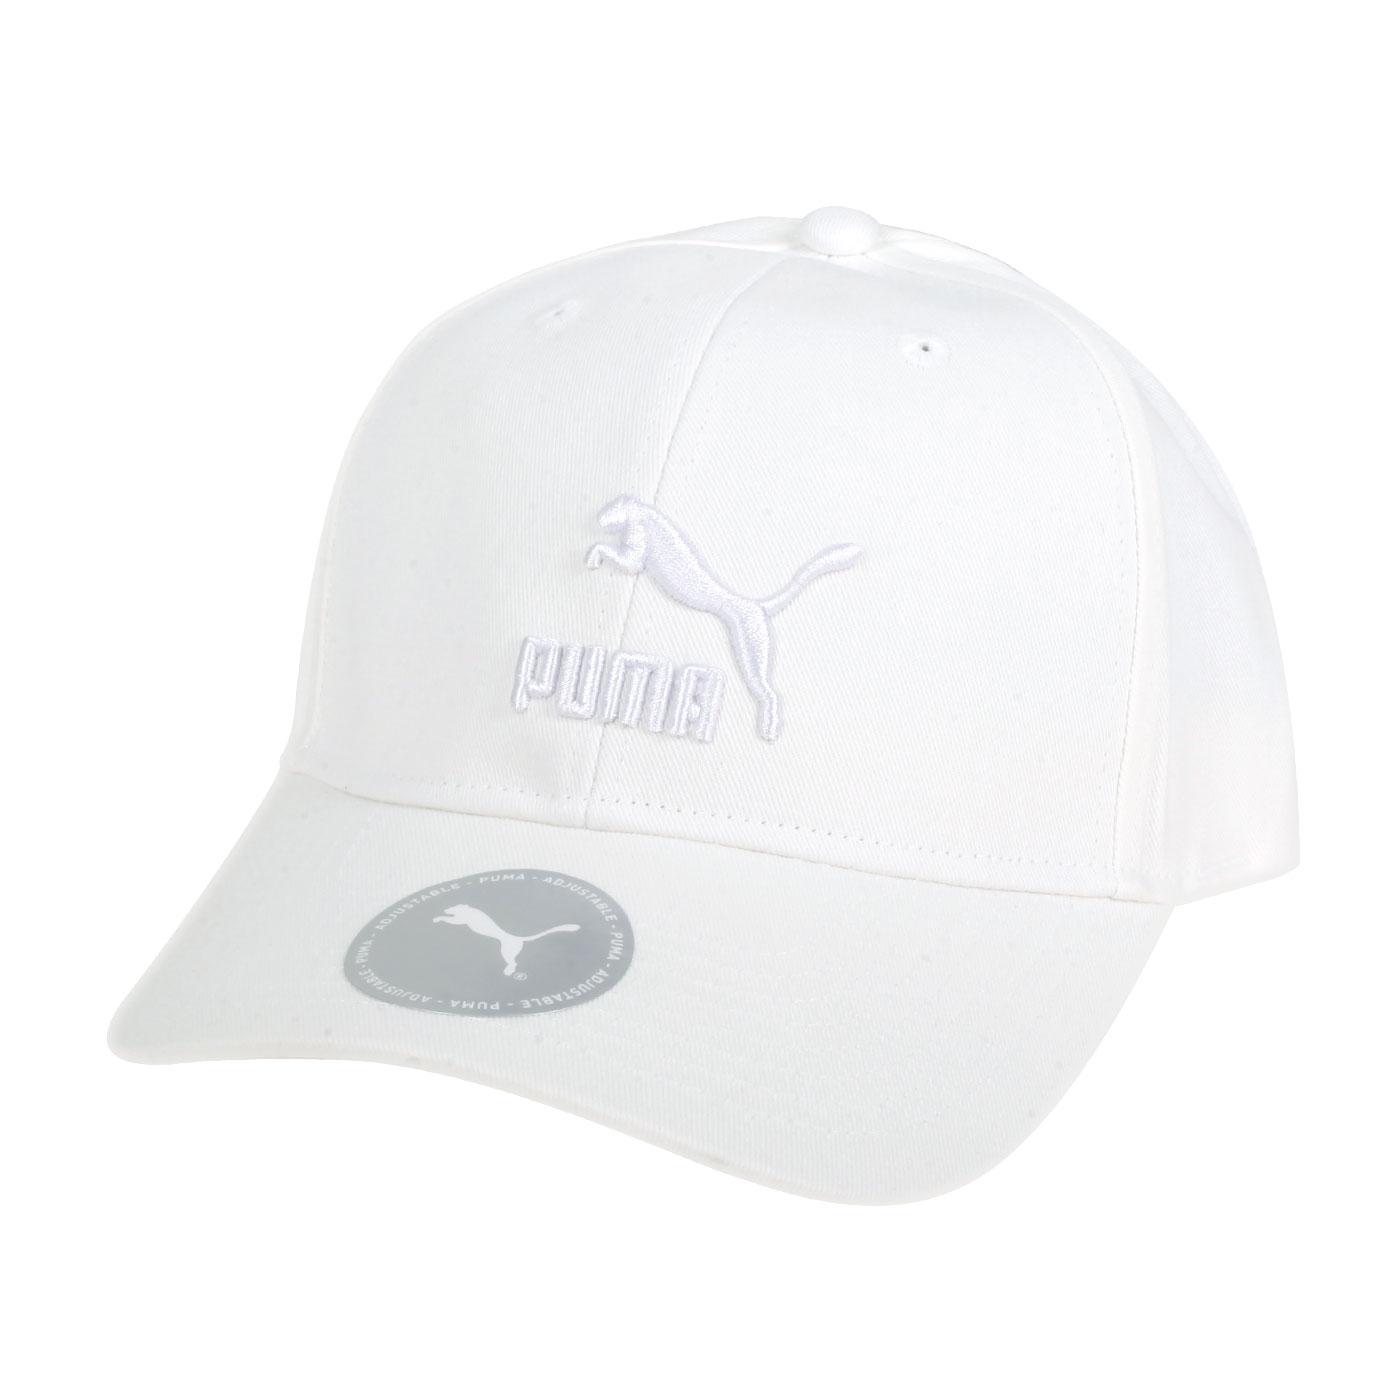 PUMA 流行系列棒球帽 02255412